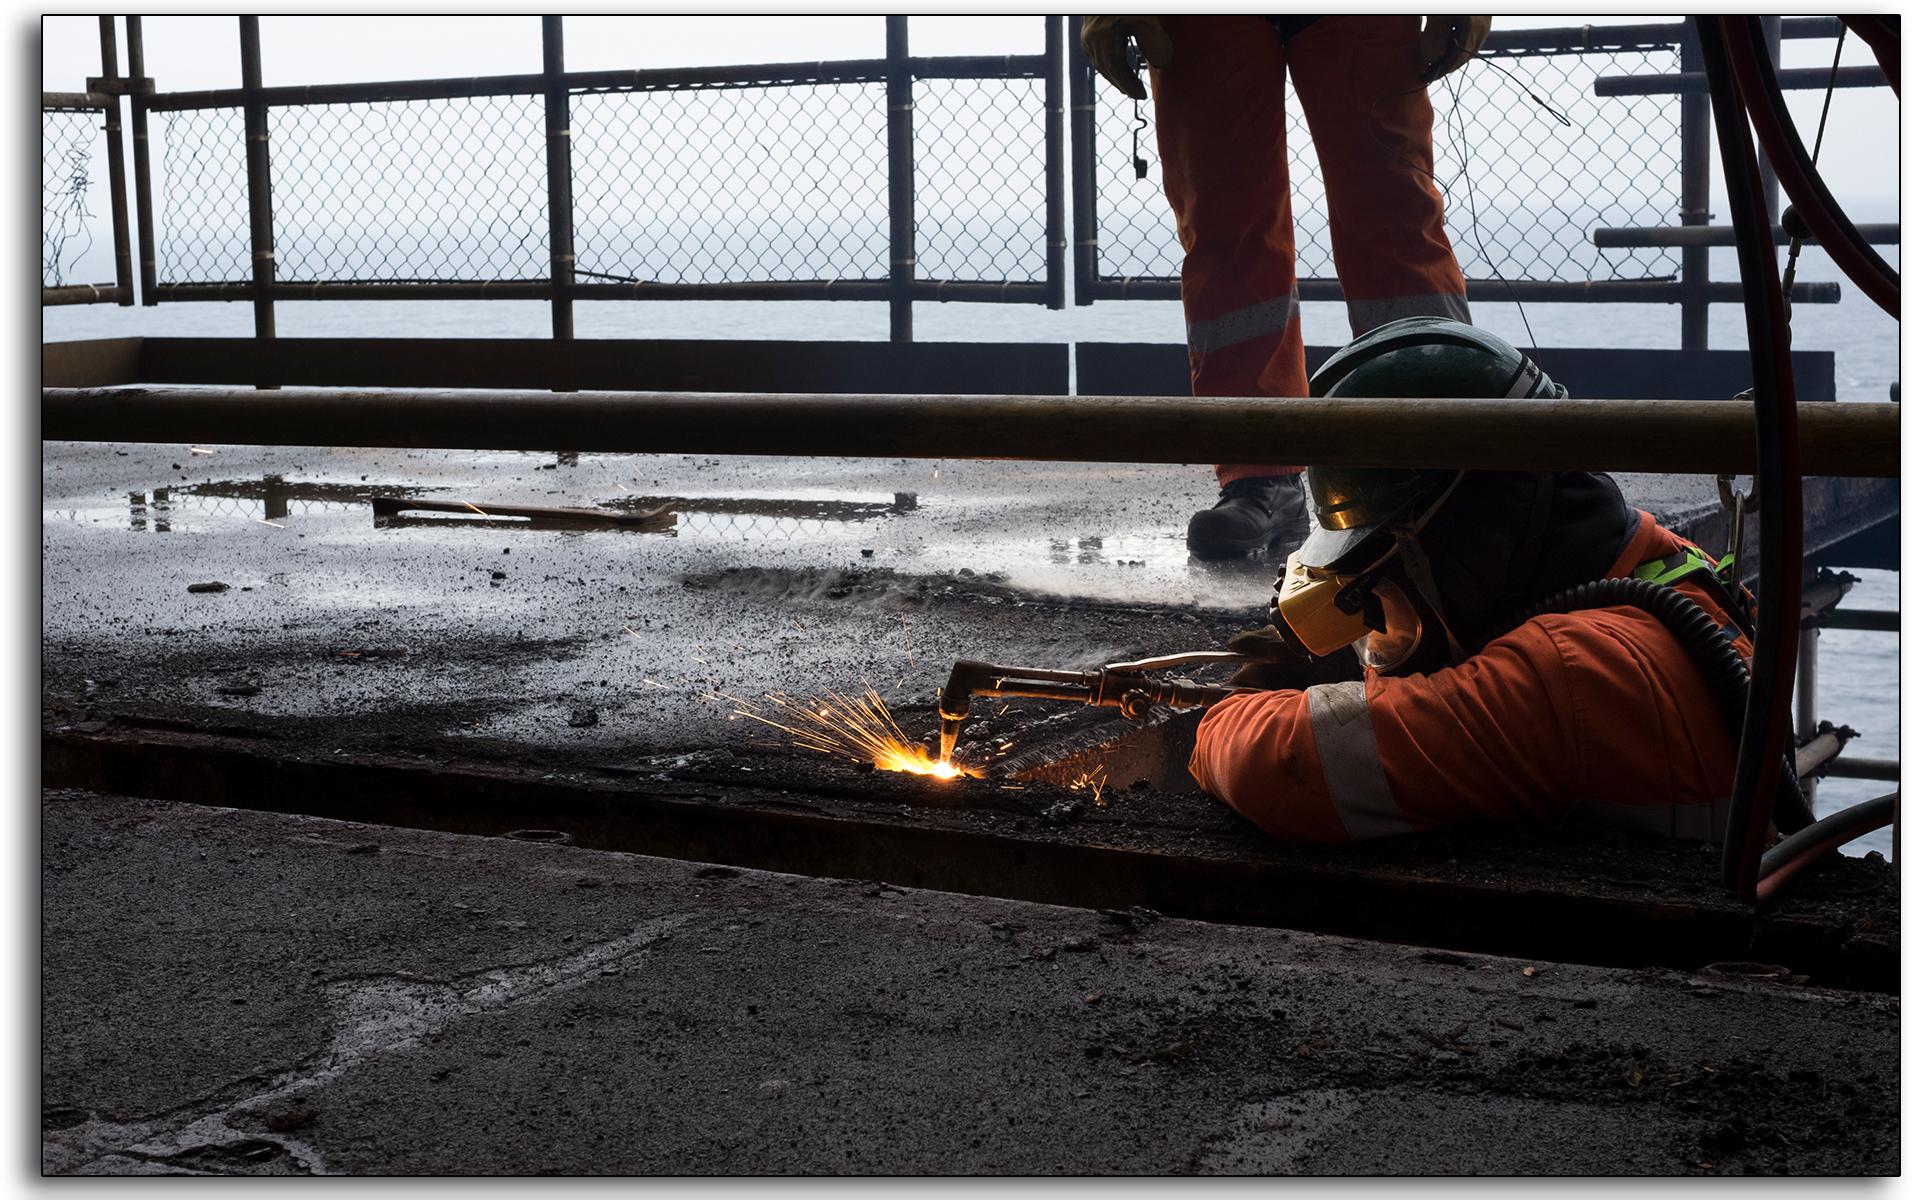 Rig burning, welding, oxygen, acetylene, cutting, BP Miller, Decommissioning, industrial, removal, Saipem, Petrofac, BP, Lee Ramsden, hotwork 03.jpg